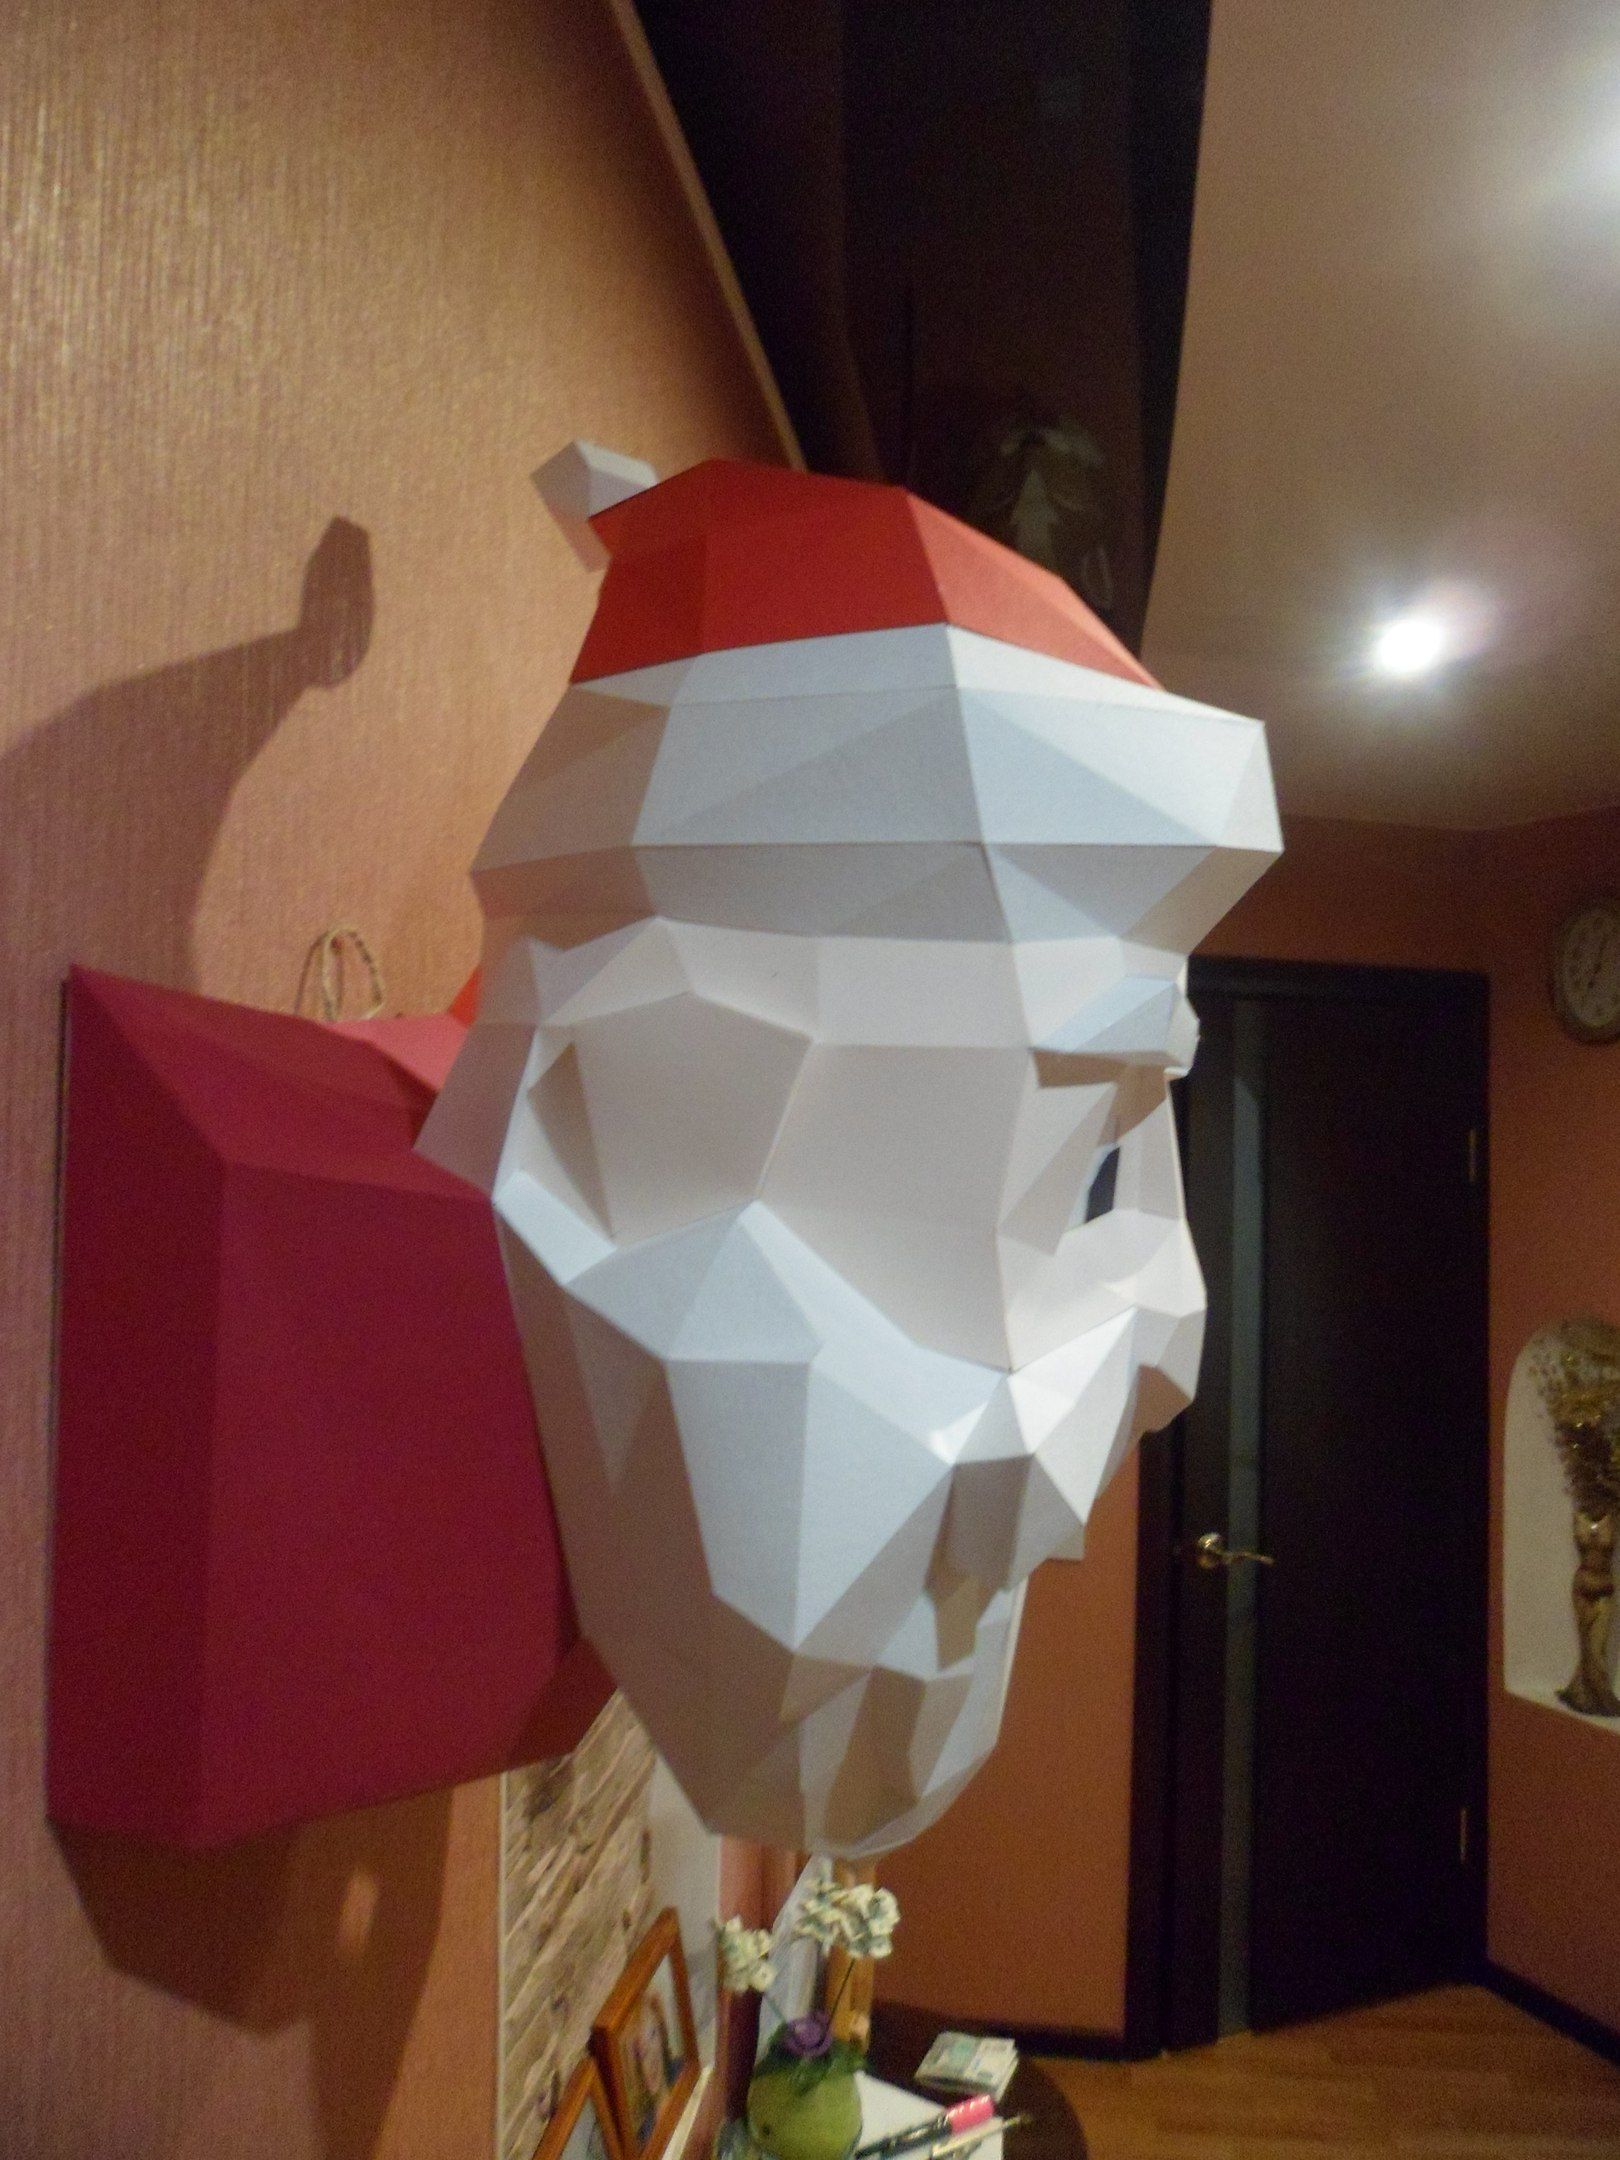 Santa Claus Paper Santa Paper Model 3d Model Papercraft Etsy Paper Models Paper Crafts Paper Sculpture